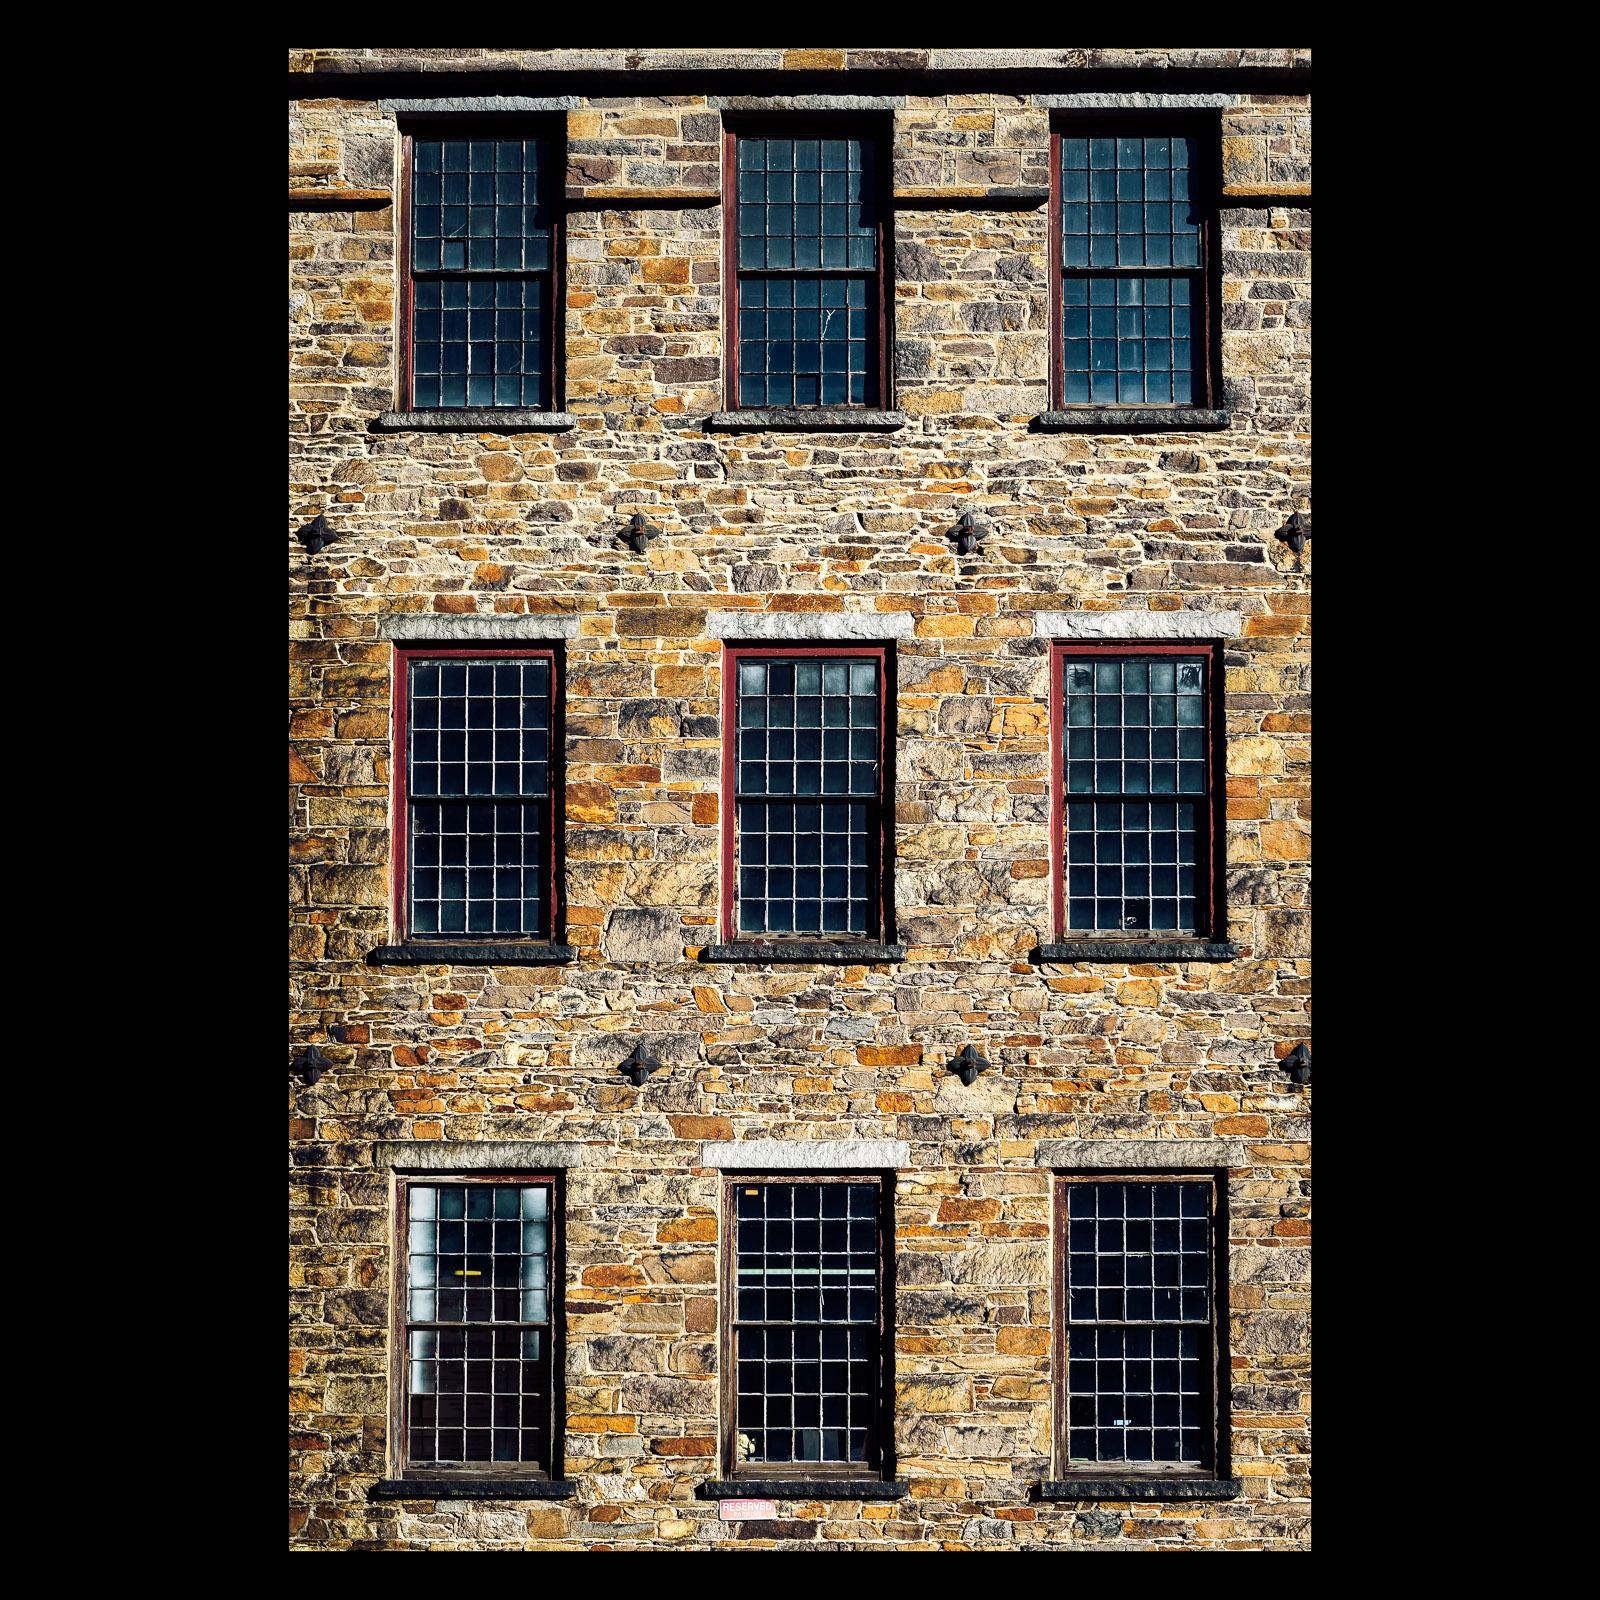 2016-02-02-window-treatments-090.jpg